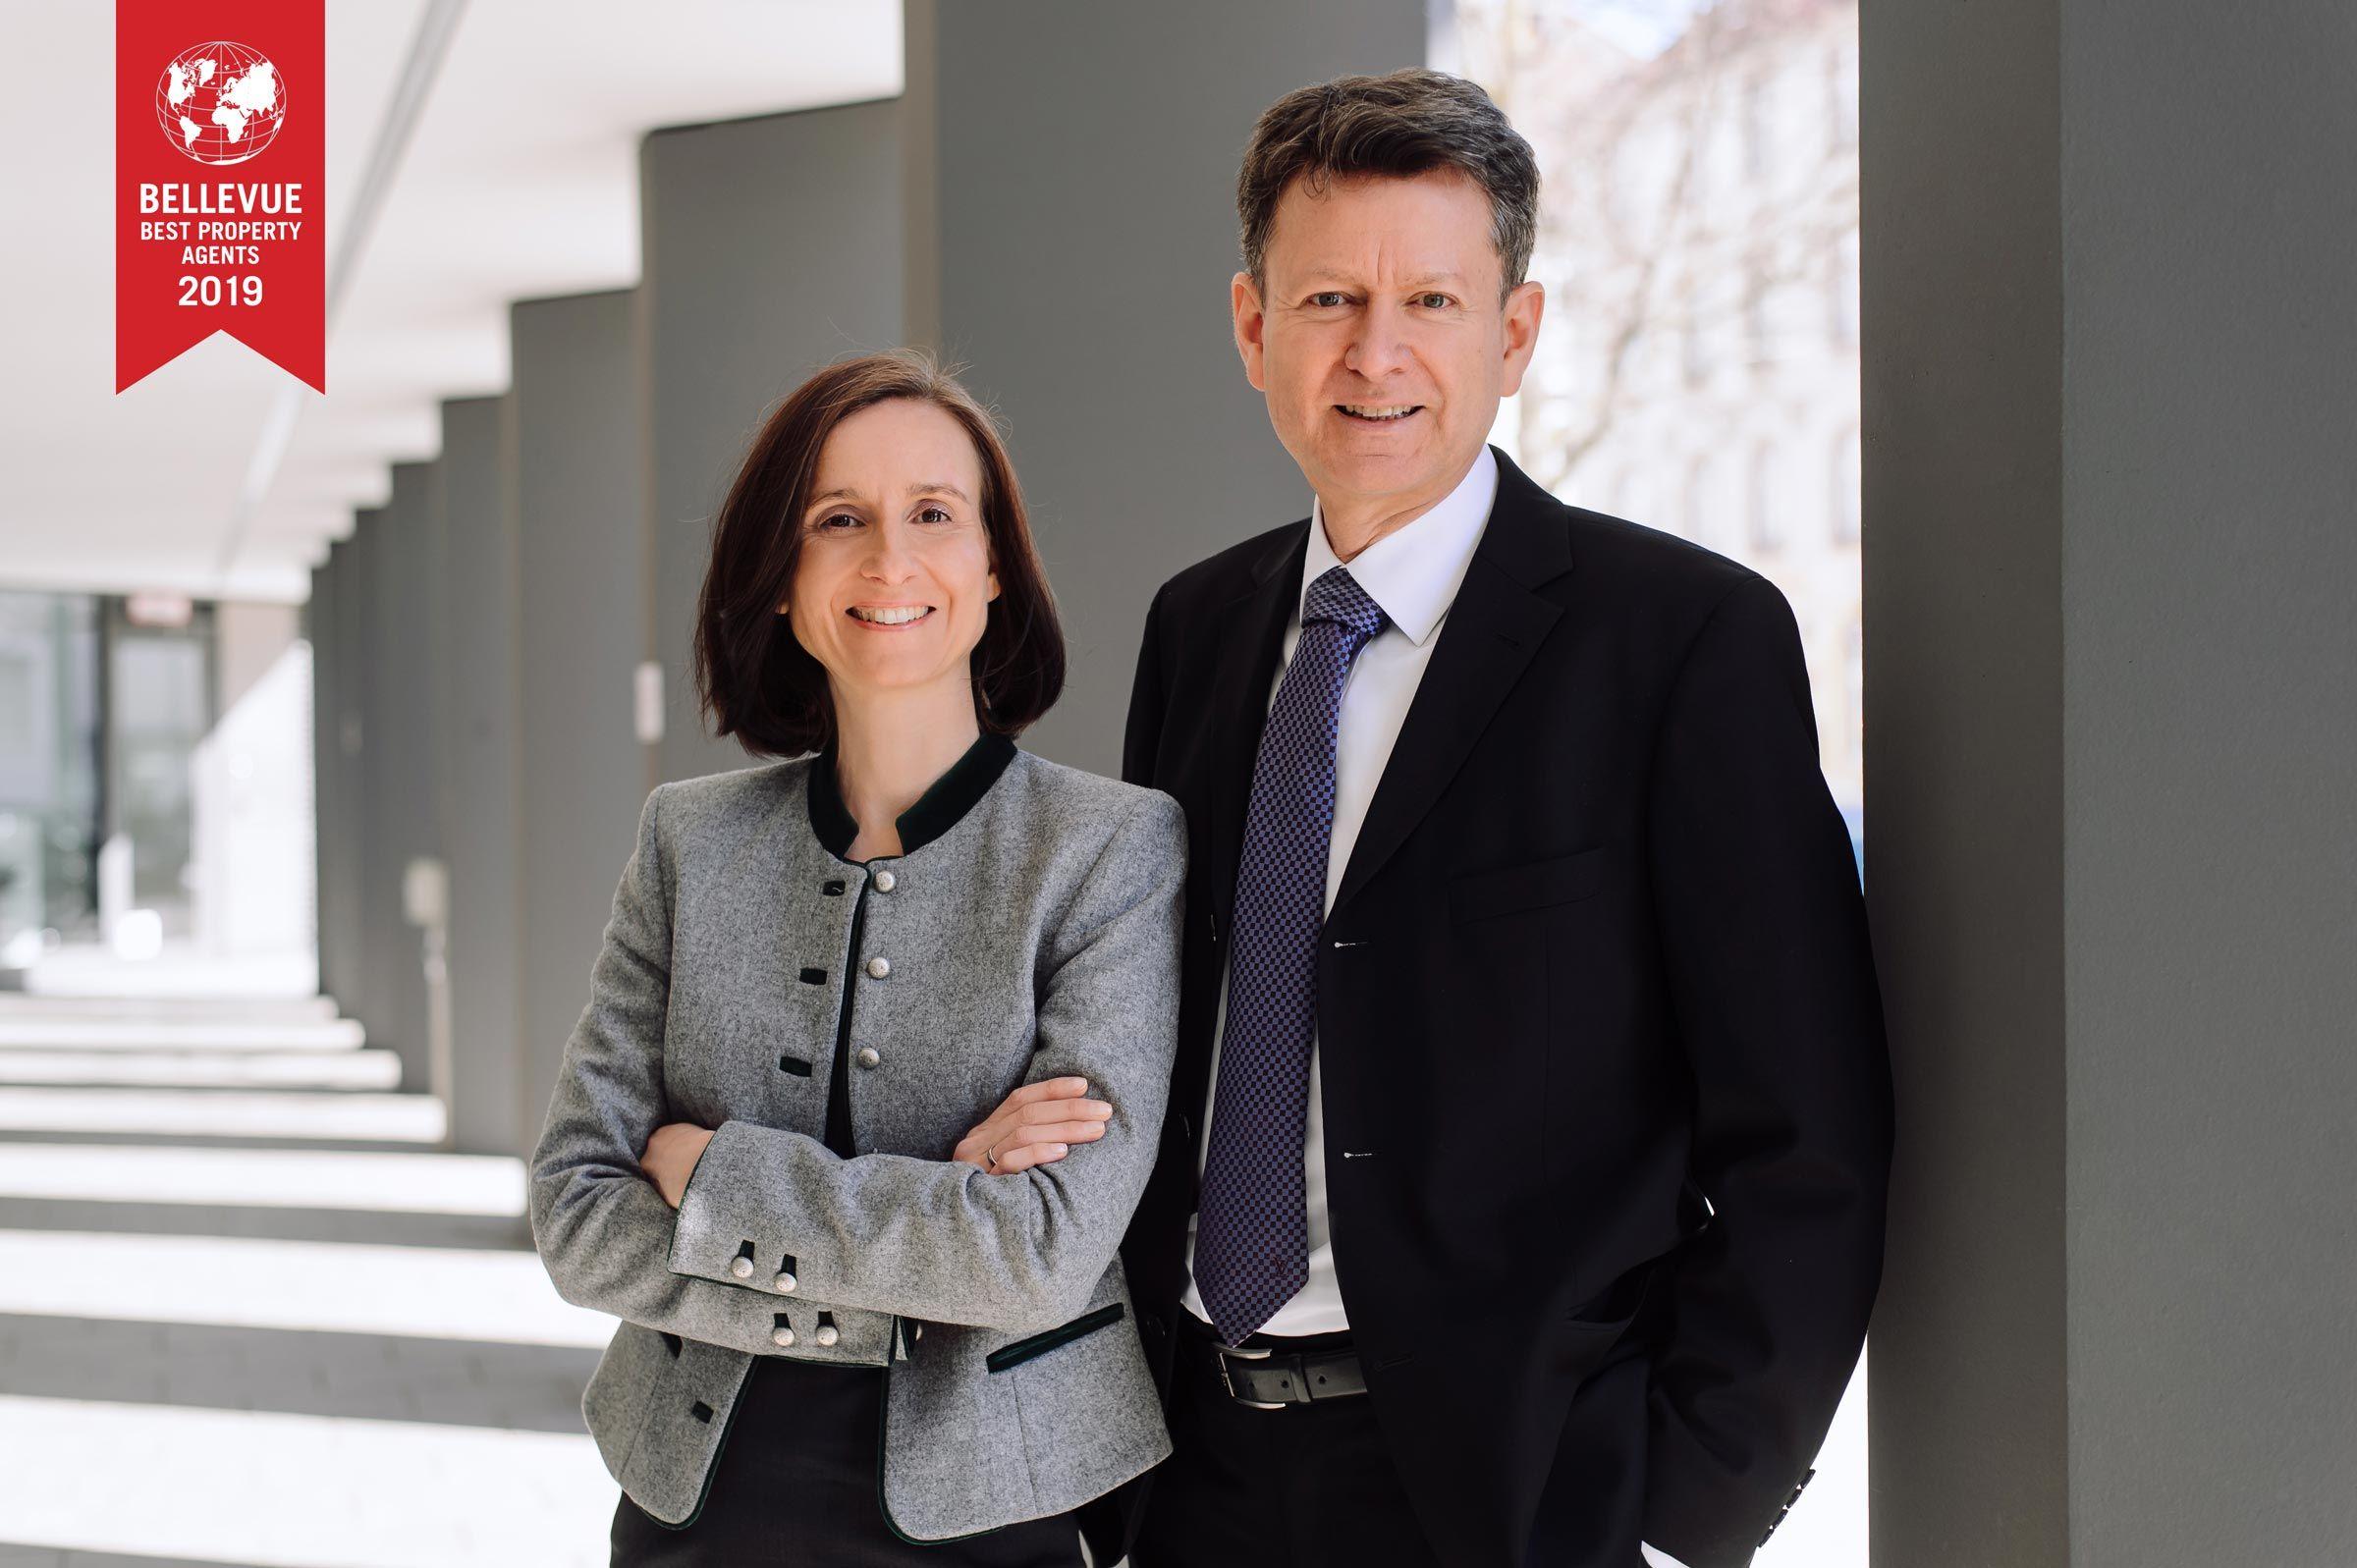 Katerina und Thomas Rogers, Immobilienmakler